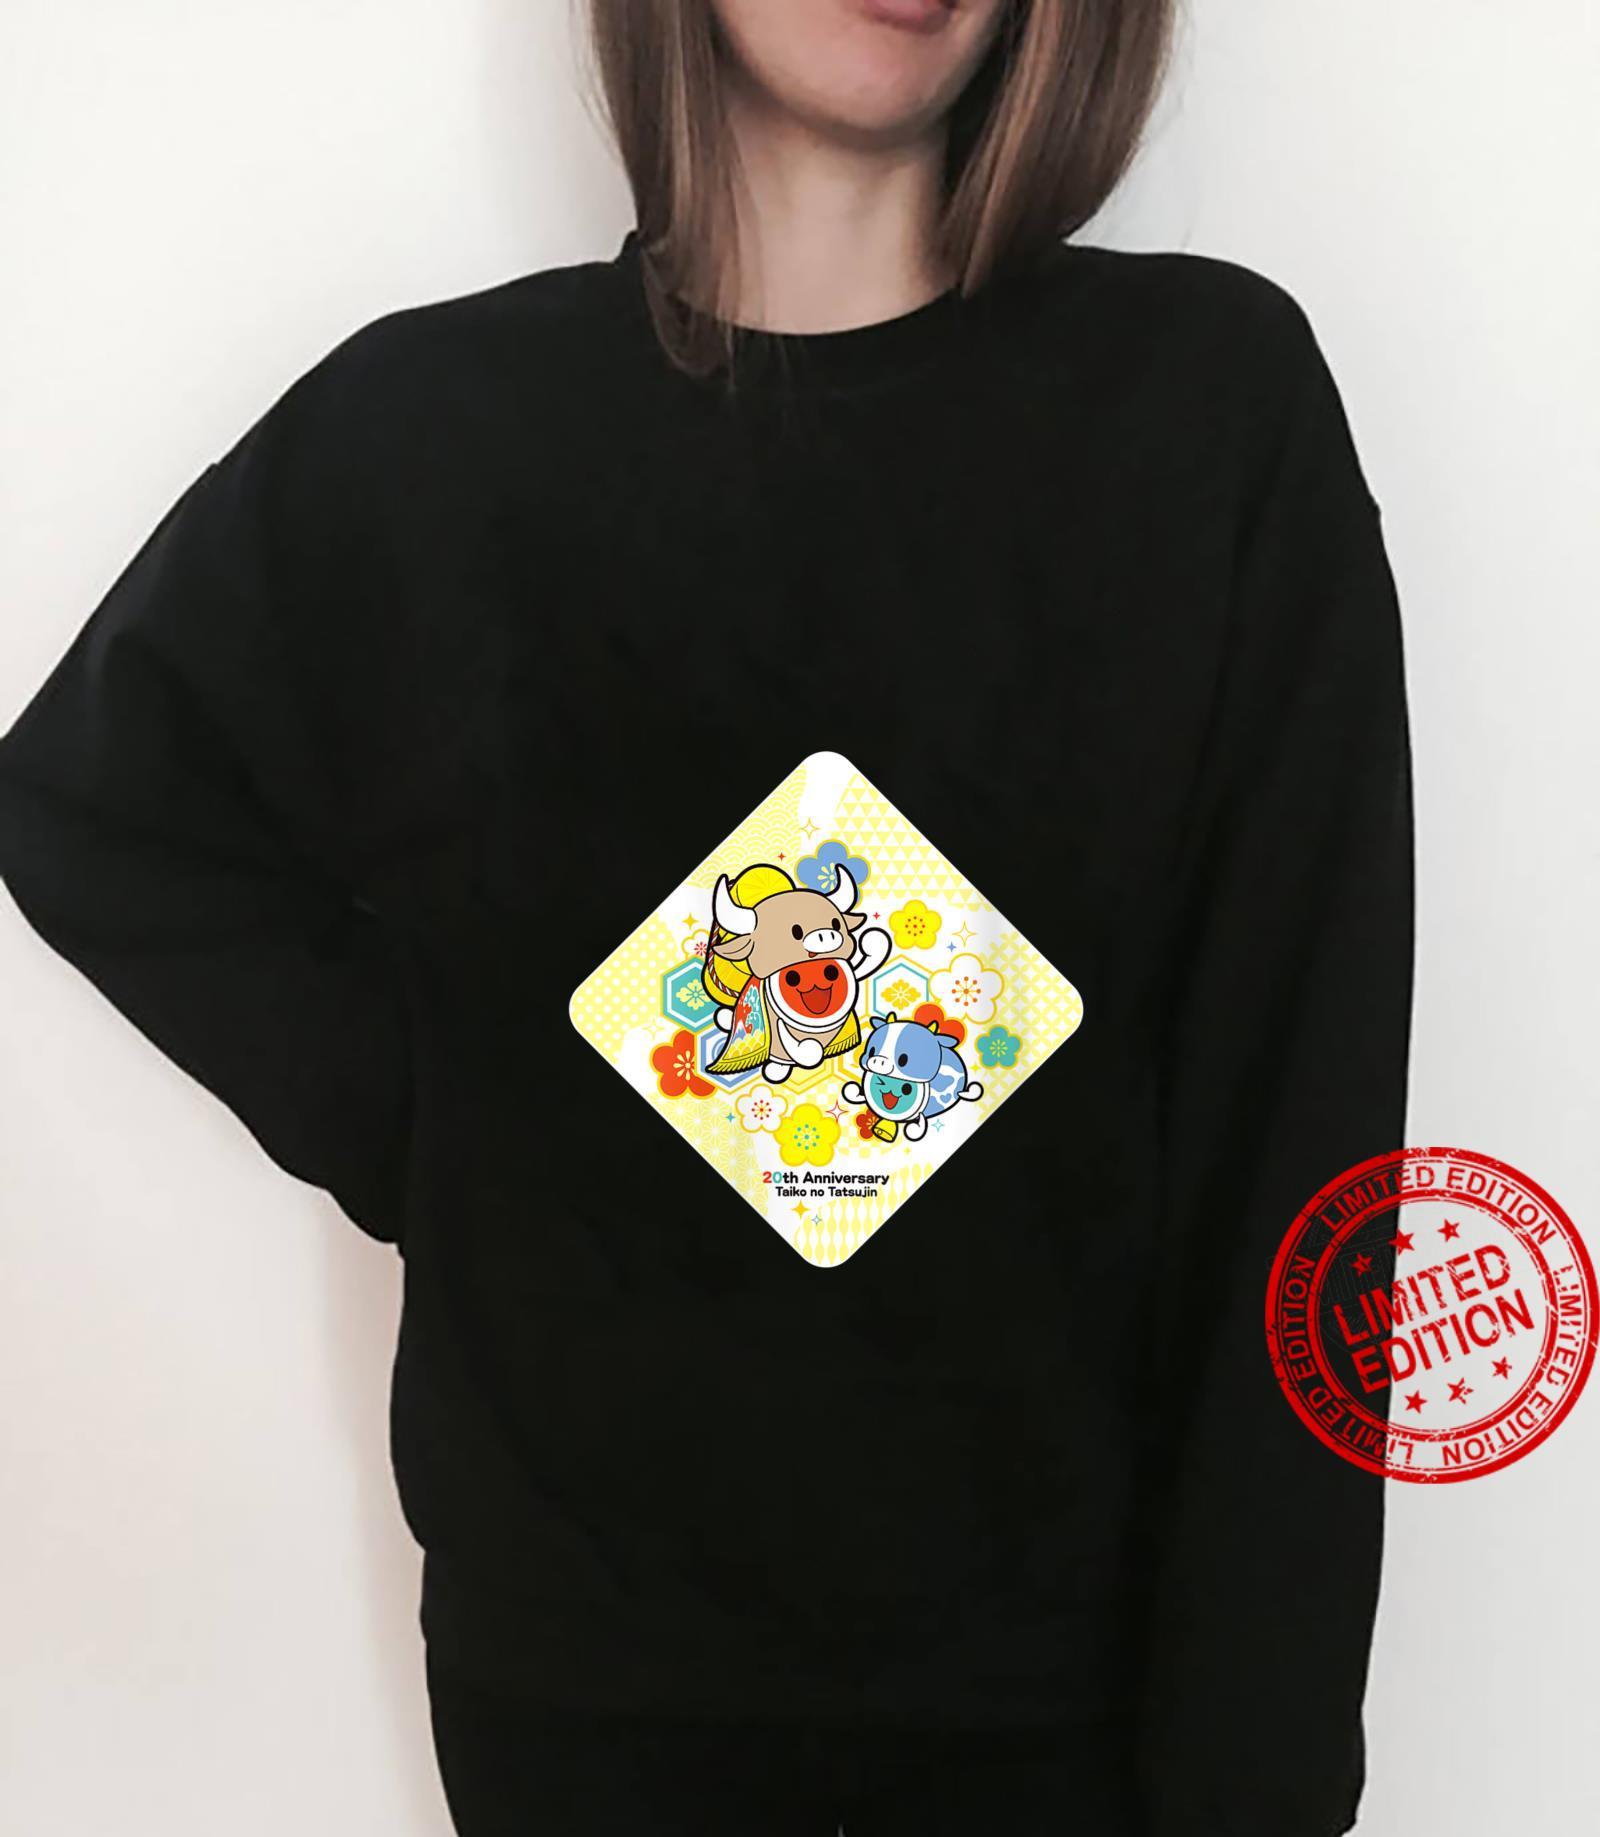 Womens Taiko no Tatsujin Shirt sweater